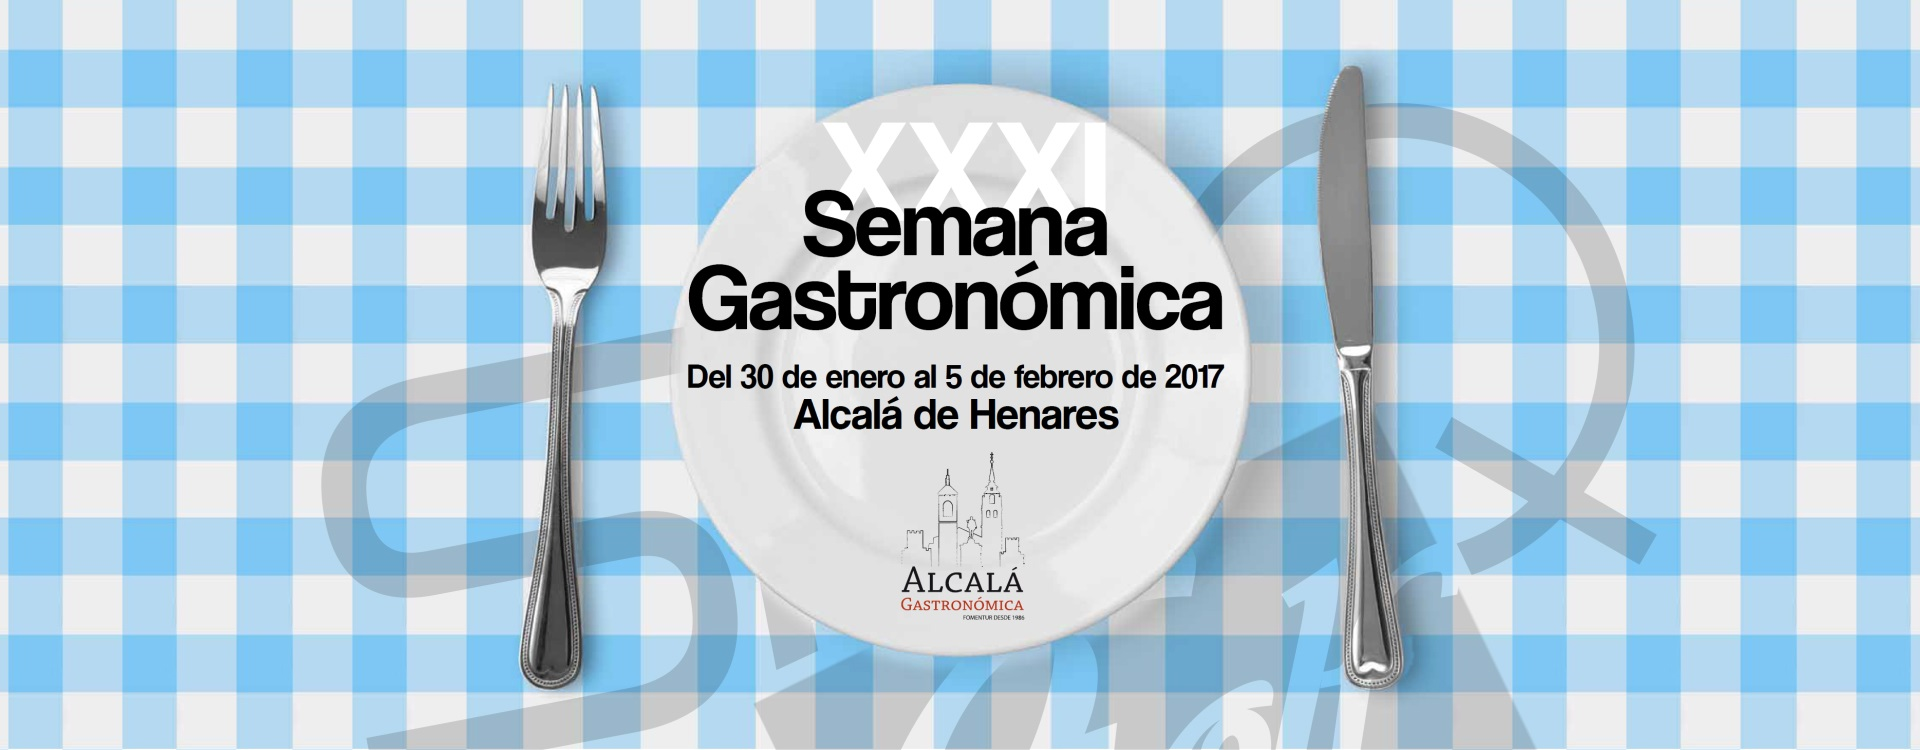 Sabores Mas que Golf ALCALA GASTRONÓMICA FOMENTUR.- XXXI SEMANA GASTRONÓMICA PerfectPixel Publicidad